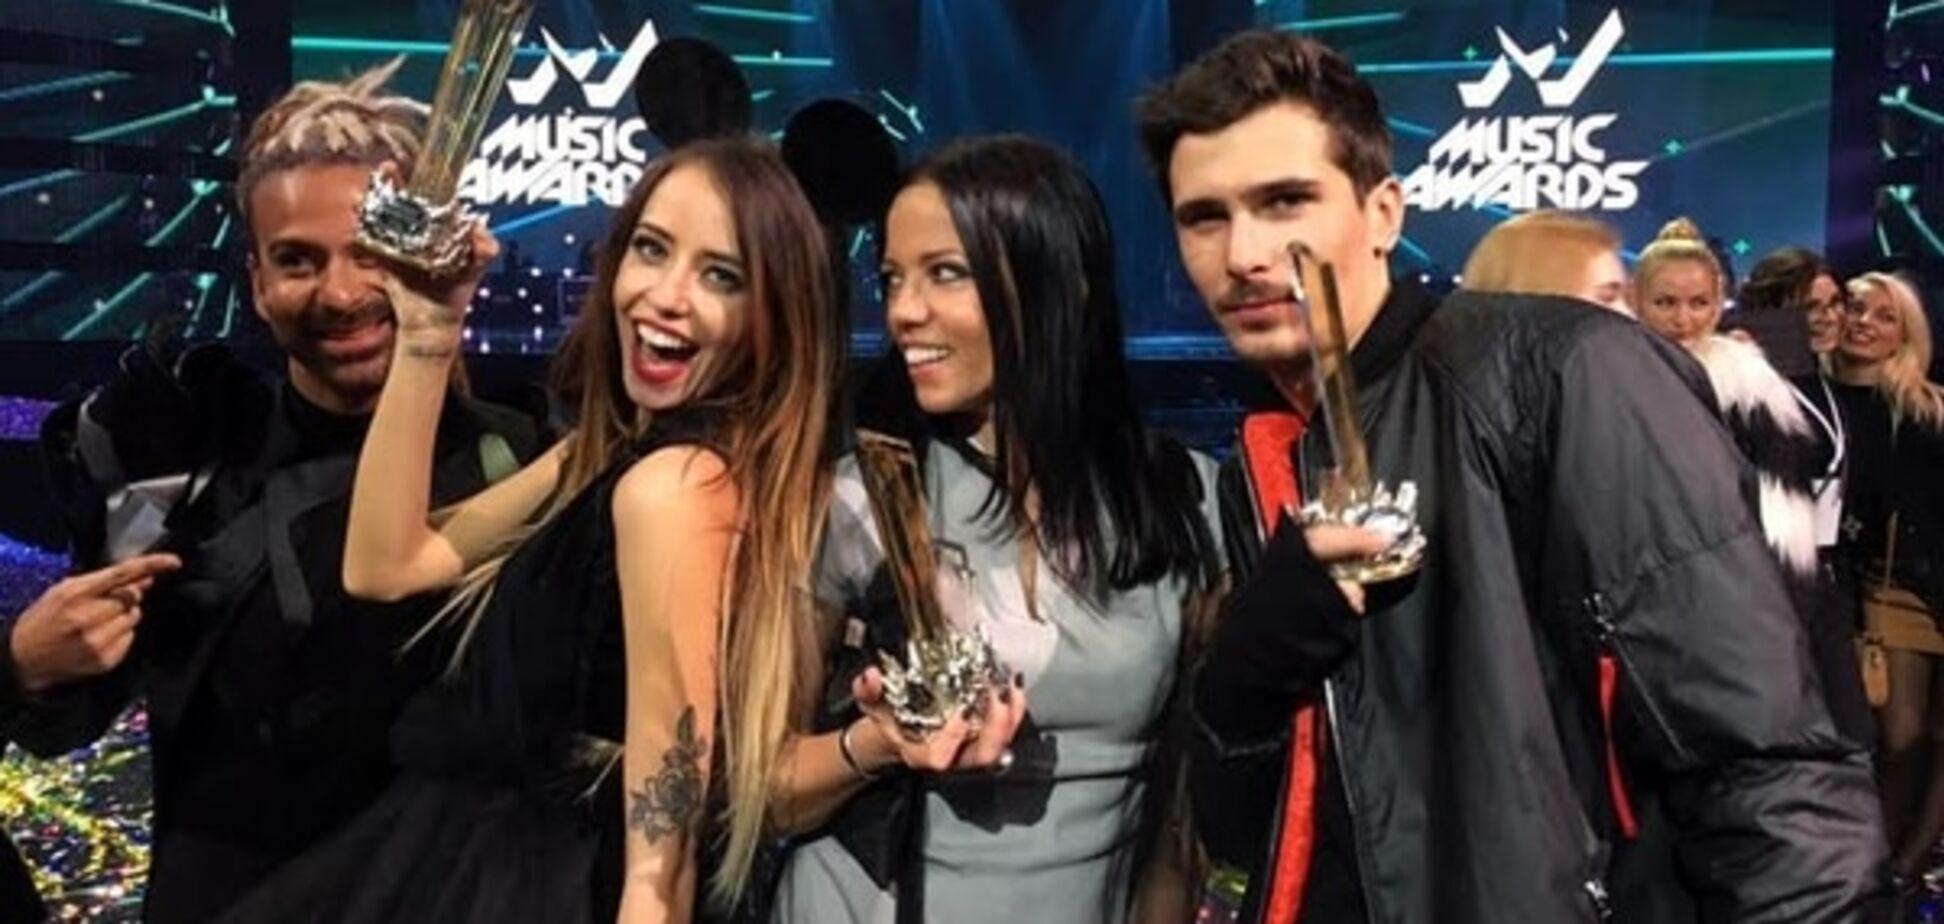 Продюсерский центр Потапа 'урвал' рекордное количество наград на M1 Music Awards